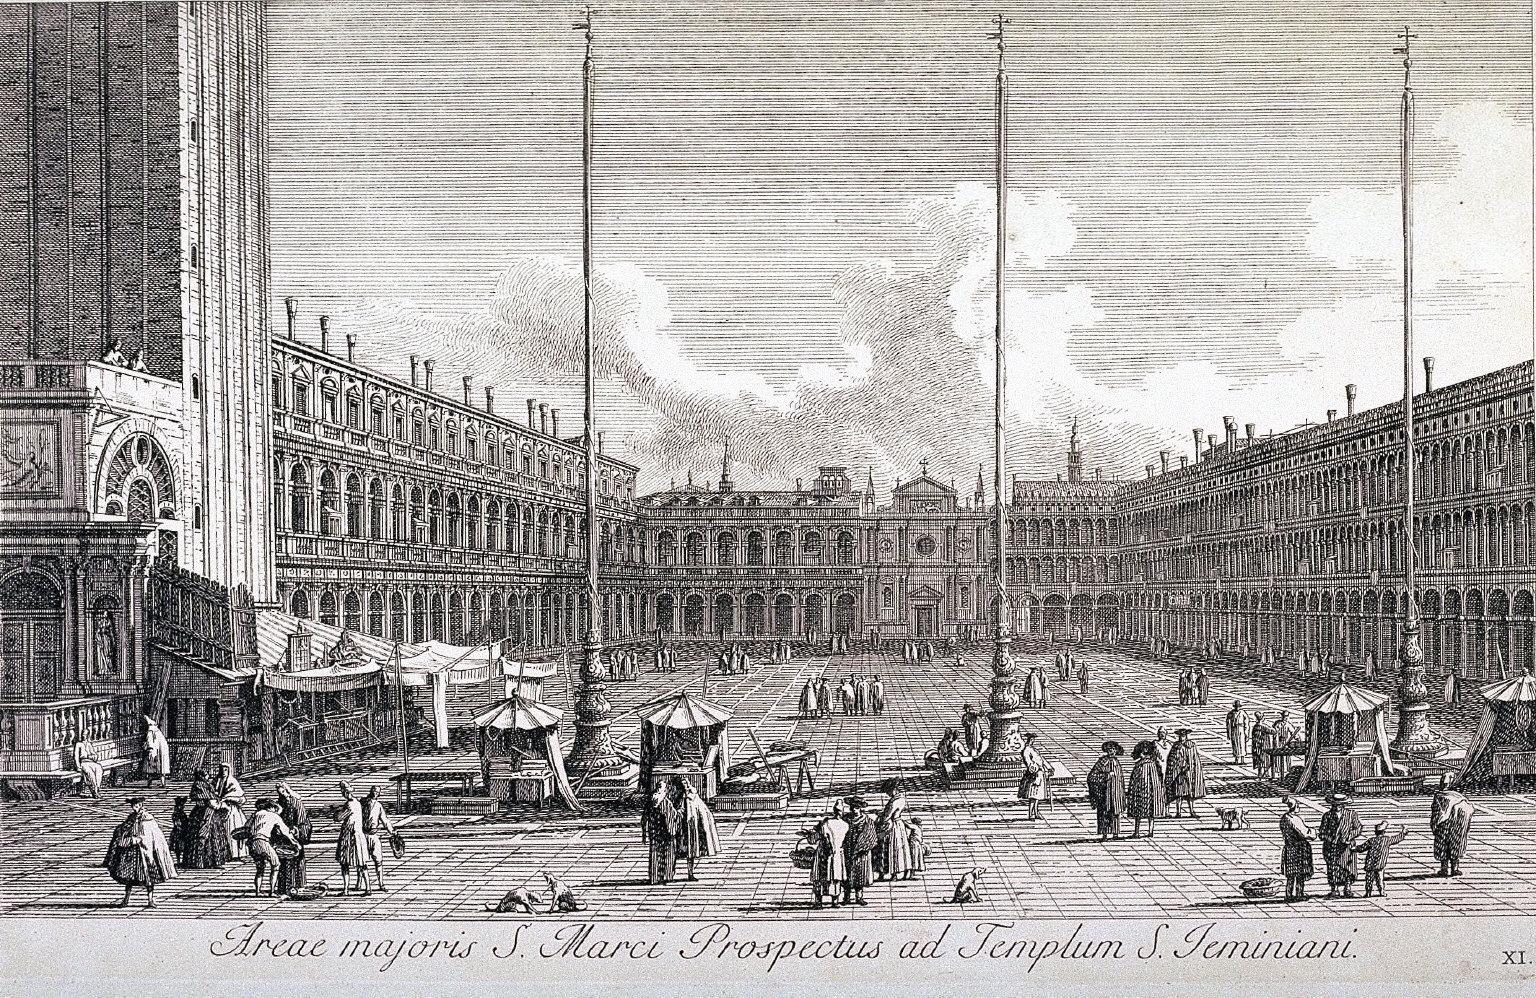 Piazza San Marco, looking towards S. Geminiano; pl.11 from Part III of the series Urbis Venetiarum Prospectus Celebriores Ex Antonio Canal...